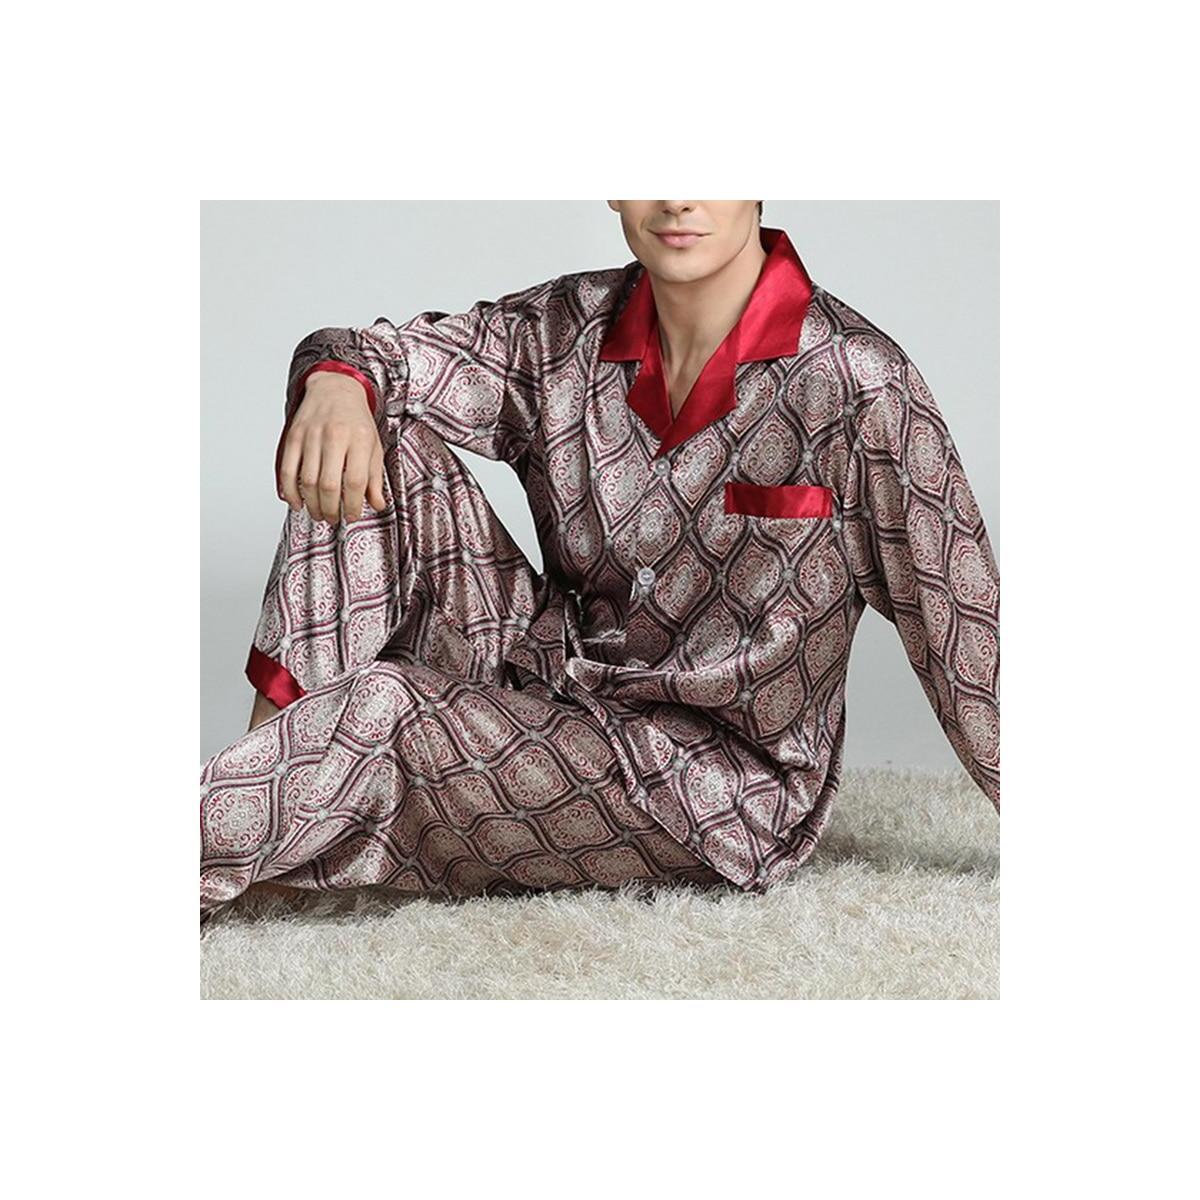 Mens Modern Luxury Print Satin Pajama Sleepwear Set, C / 5XL / China